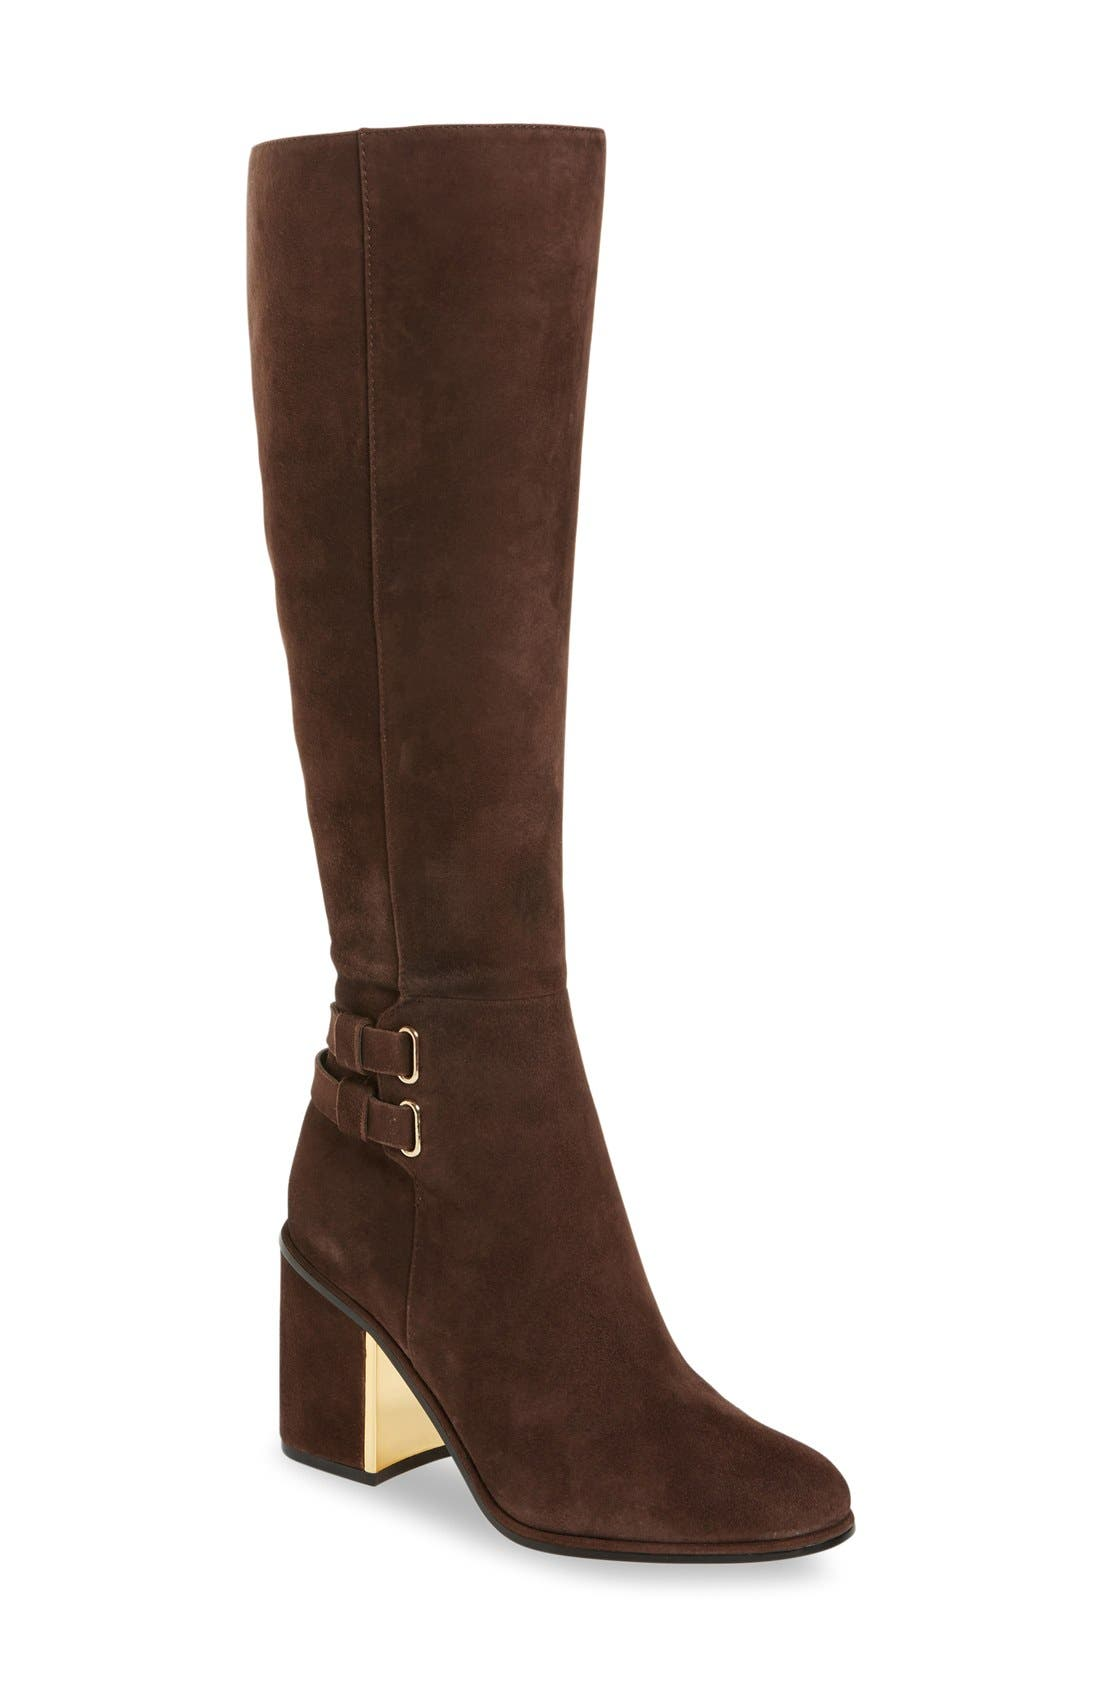 Alternate Image 1 Selected - Calvin Klein Camie Water Resistant Knee High Boot (Women)